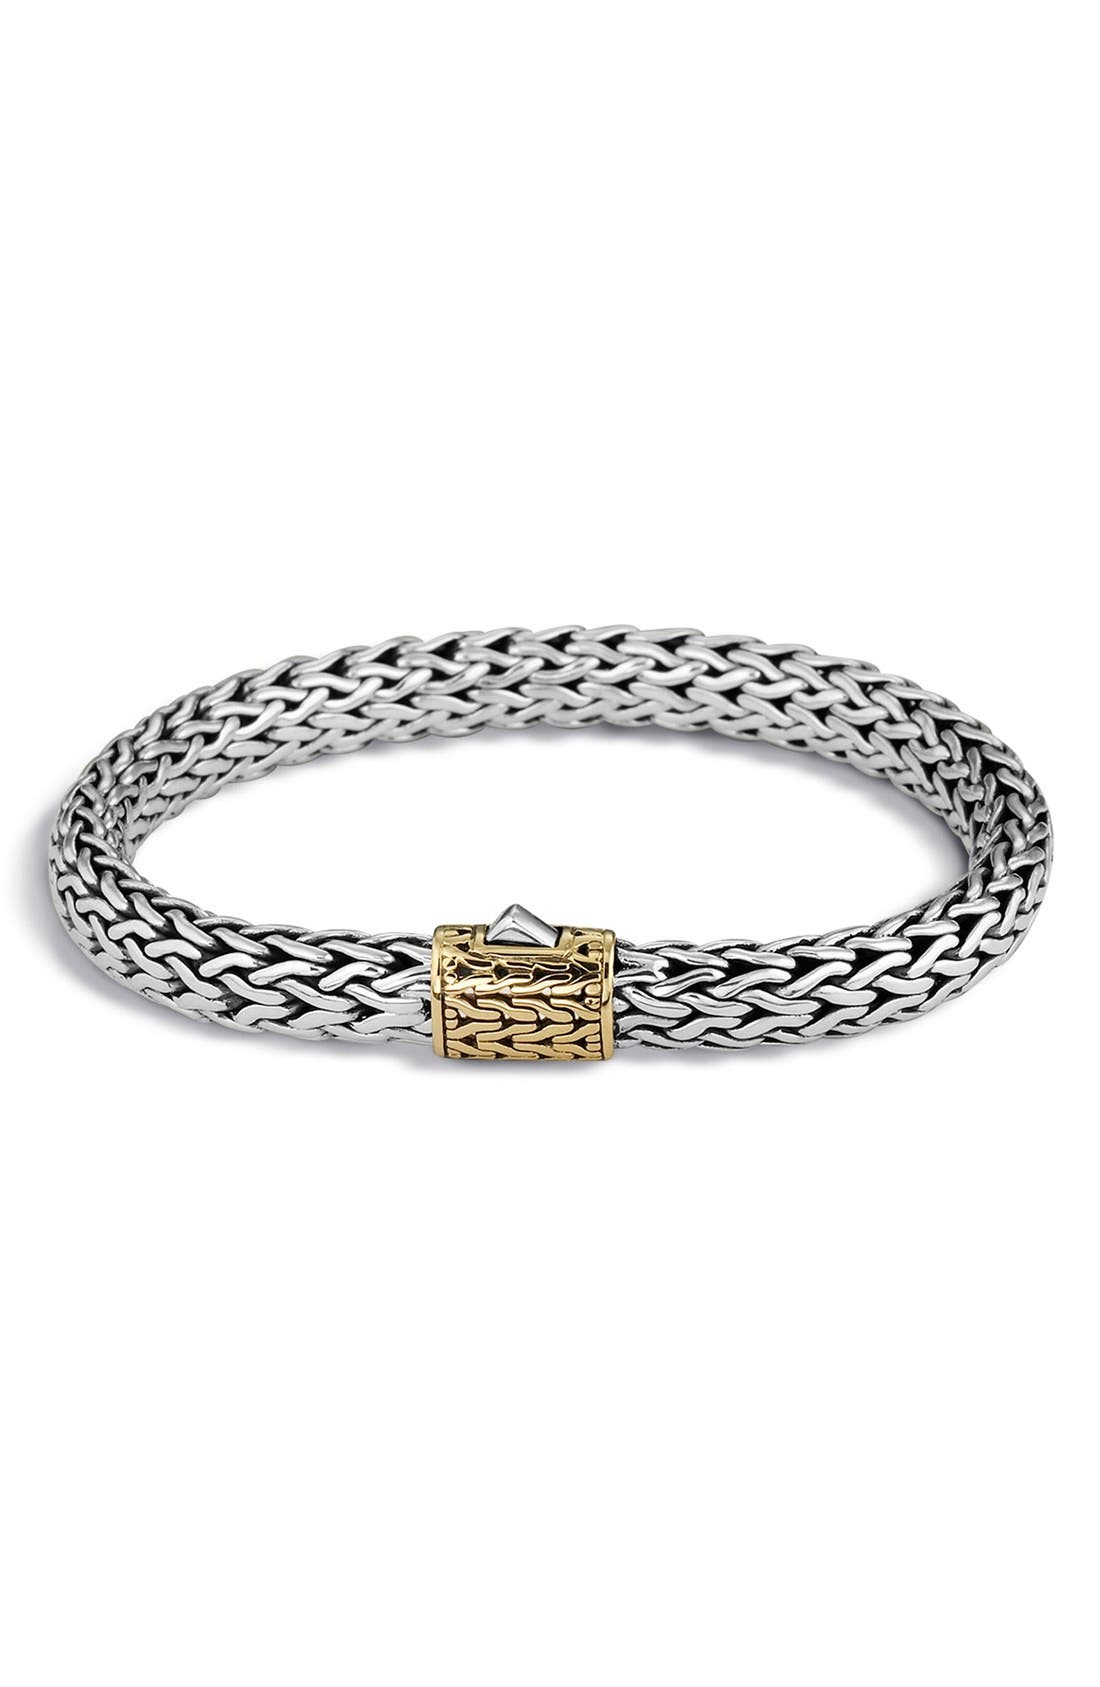 Alternate Image 1 Selected - John Hardy 'Classic Chain' Medium Bracelet